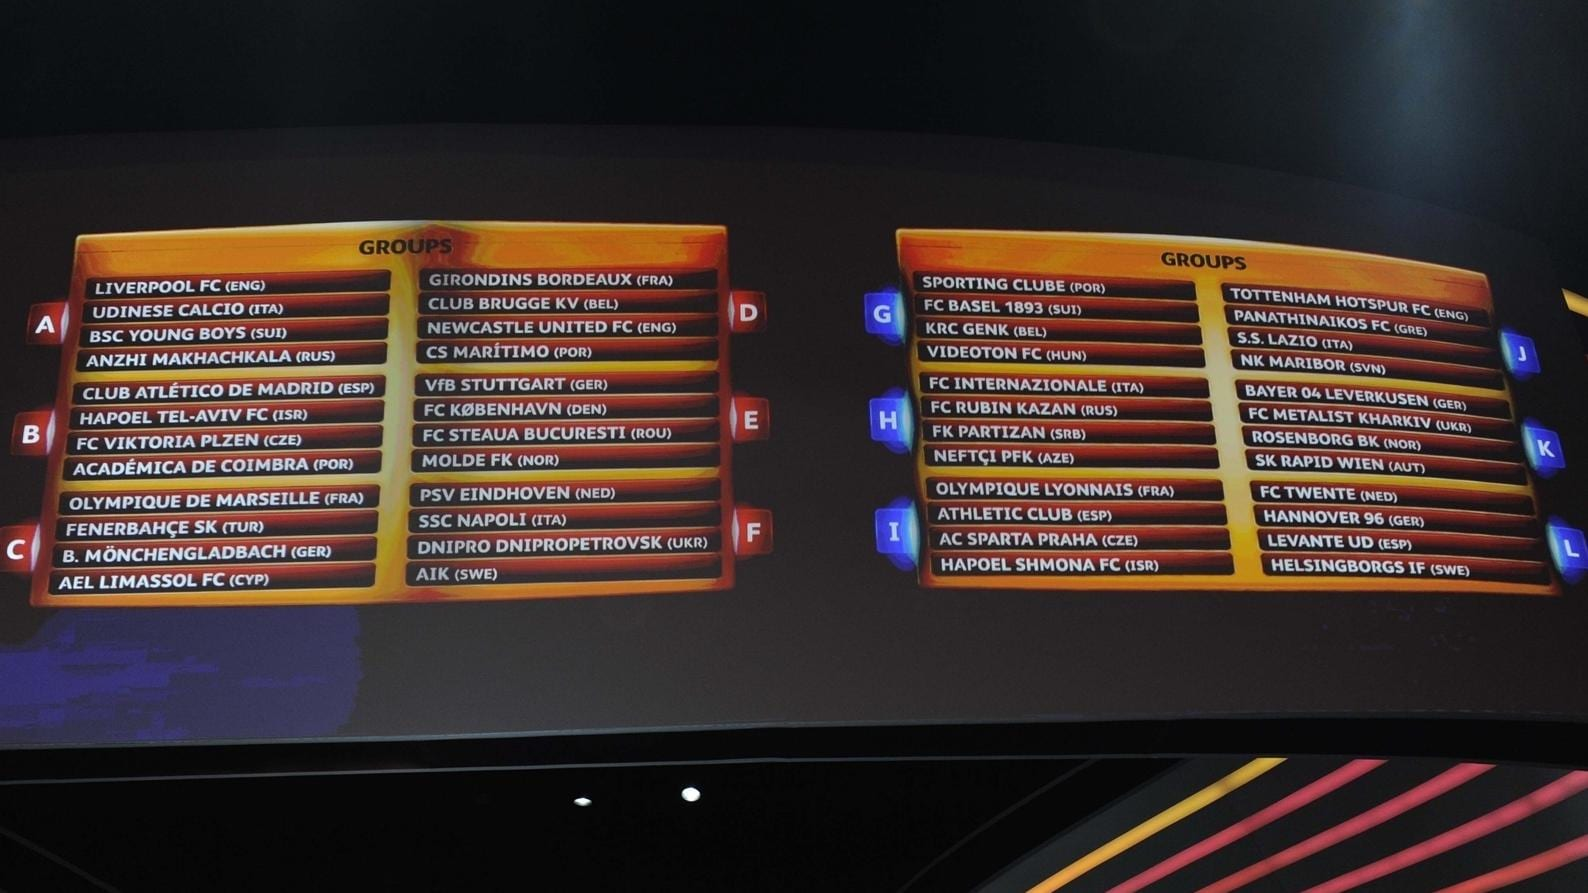 UEFA Europa League group stage draw   UEFA Europa League   UEFA.com